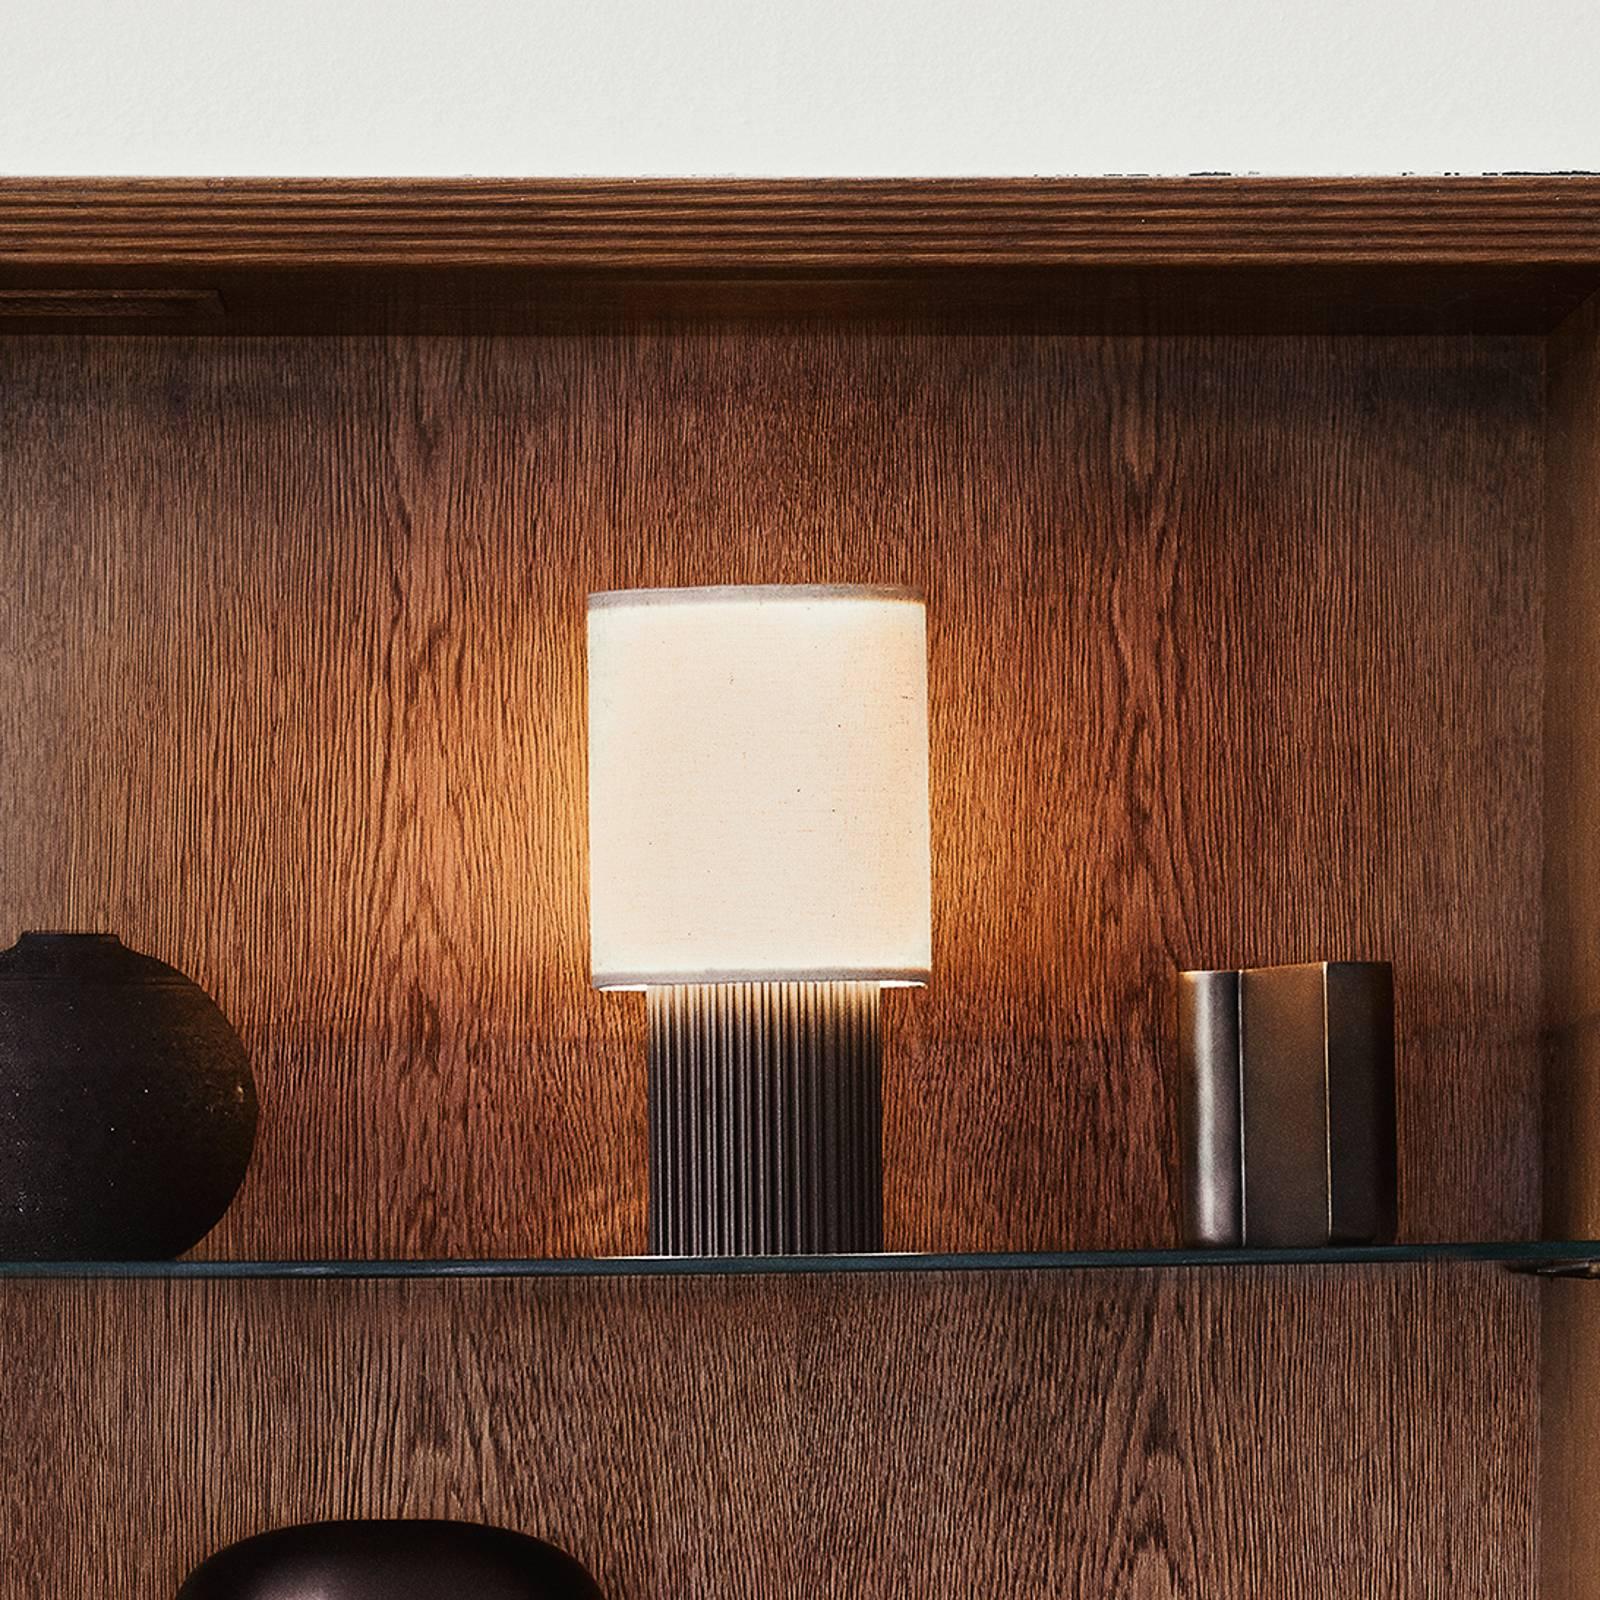 &Tradition Manhattan SC52 LED-Tischleuchte, Akku